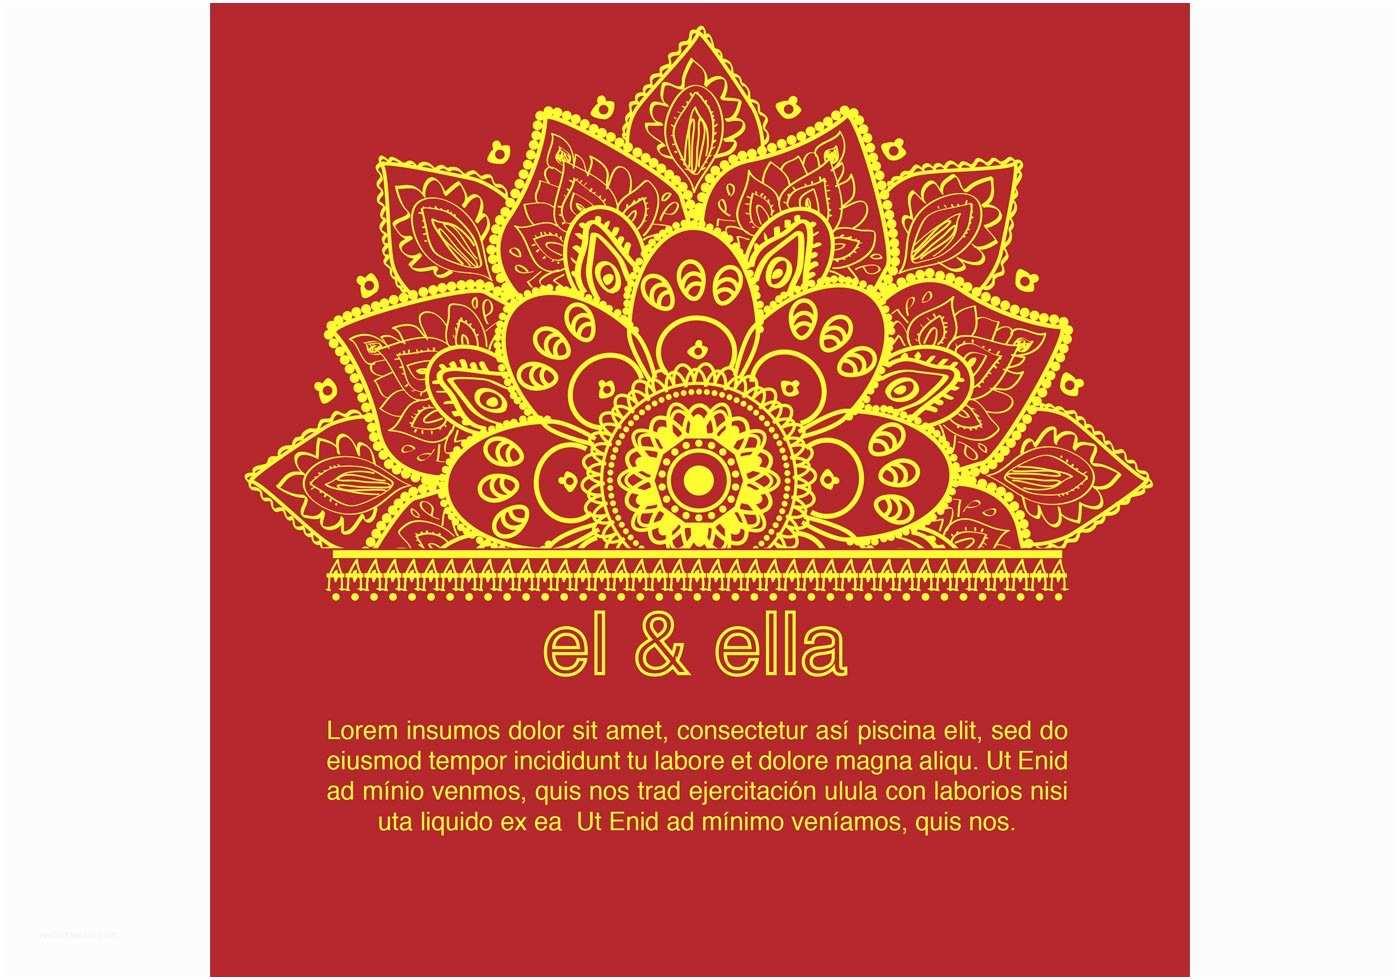 Indian Wedding Invitation Designs Free Download Indian Wedding Card Template Download Free Vector Art